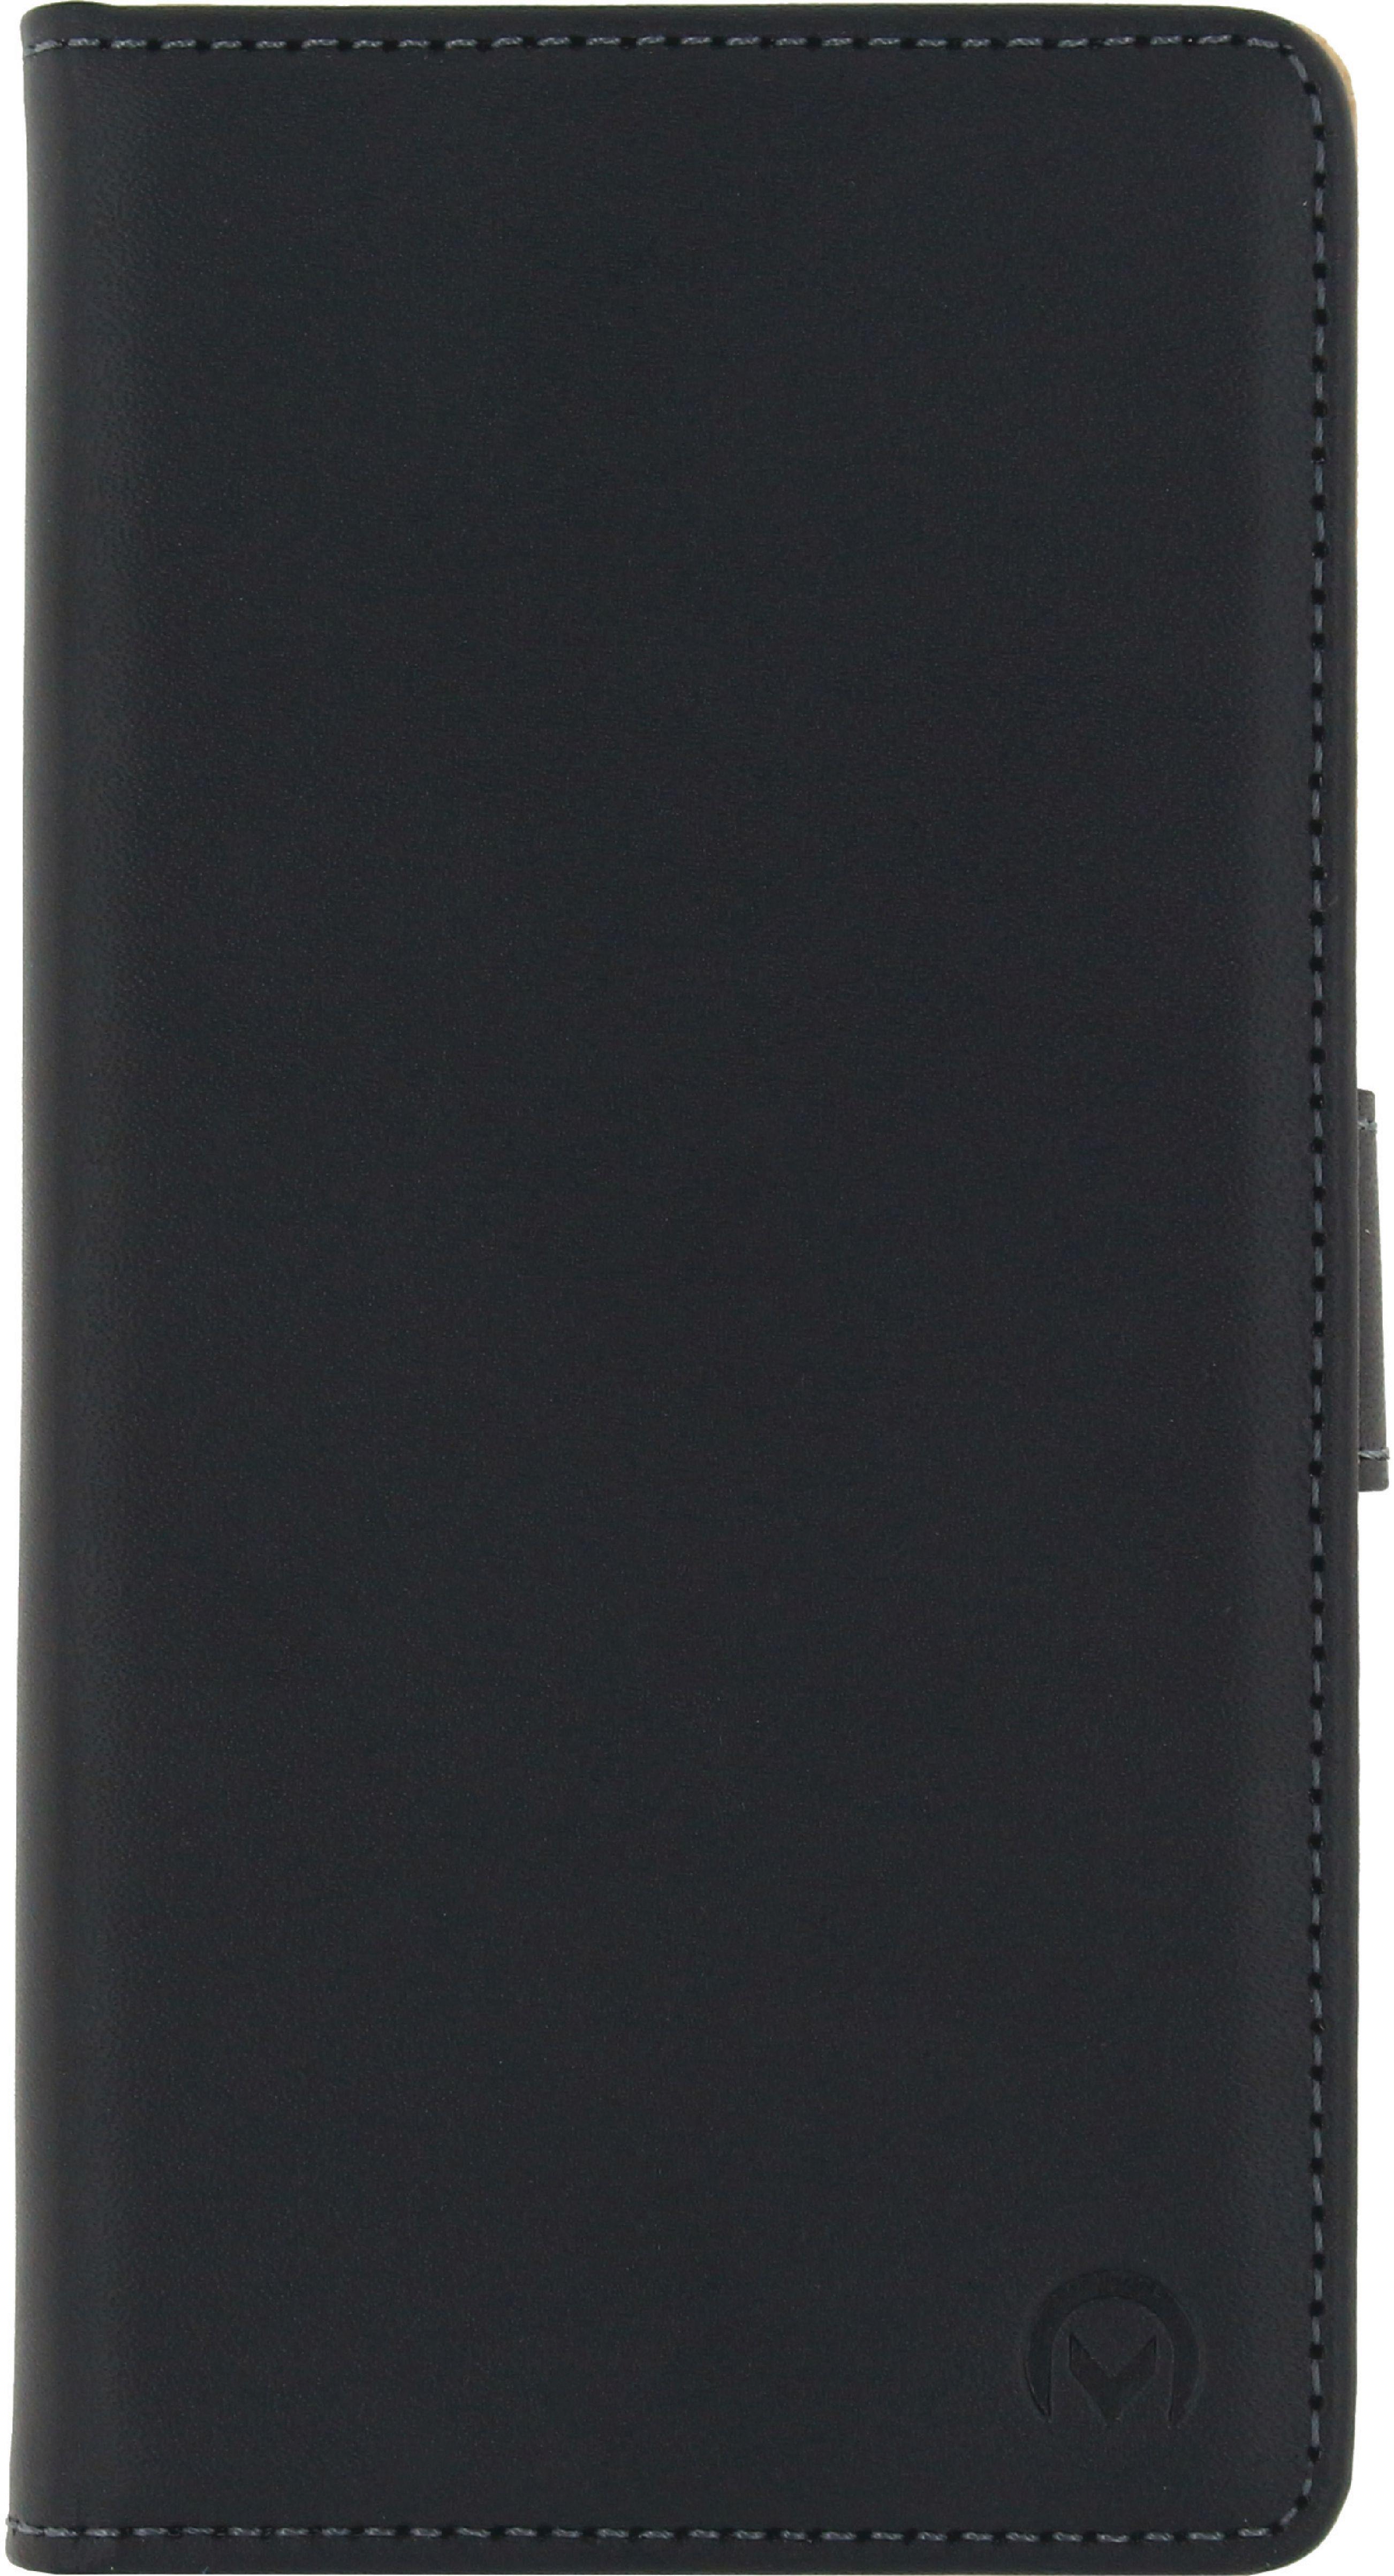 Image of   Telefon Klassisk Lommebogsetui Apple iPhone 6 / 6s Sort